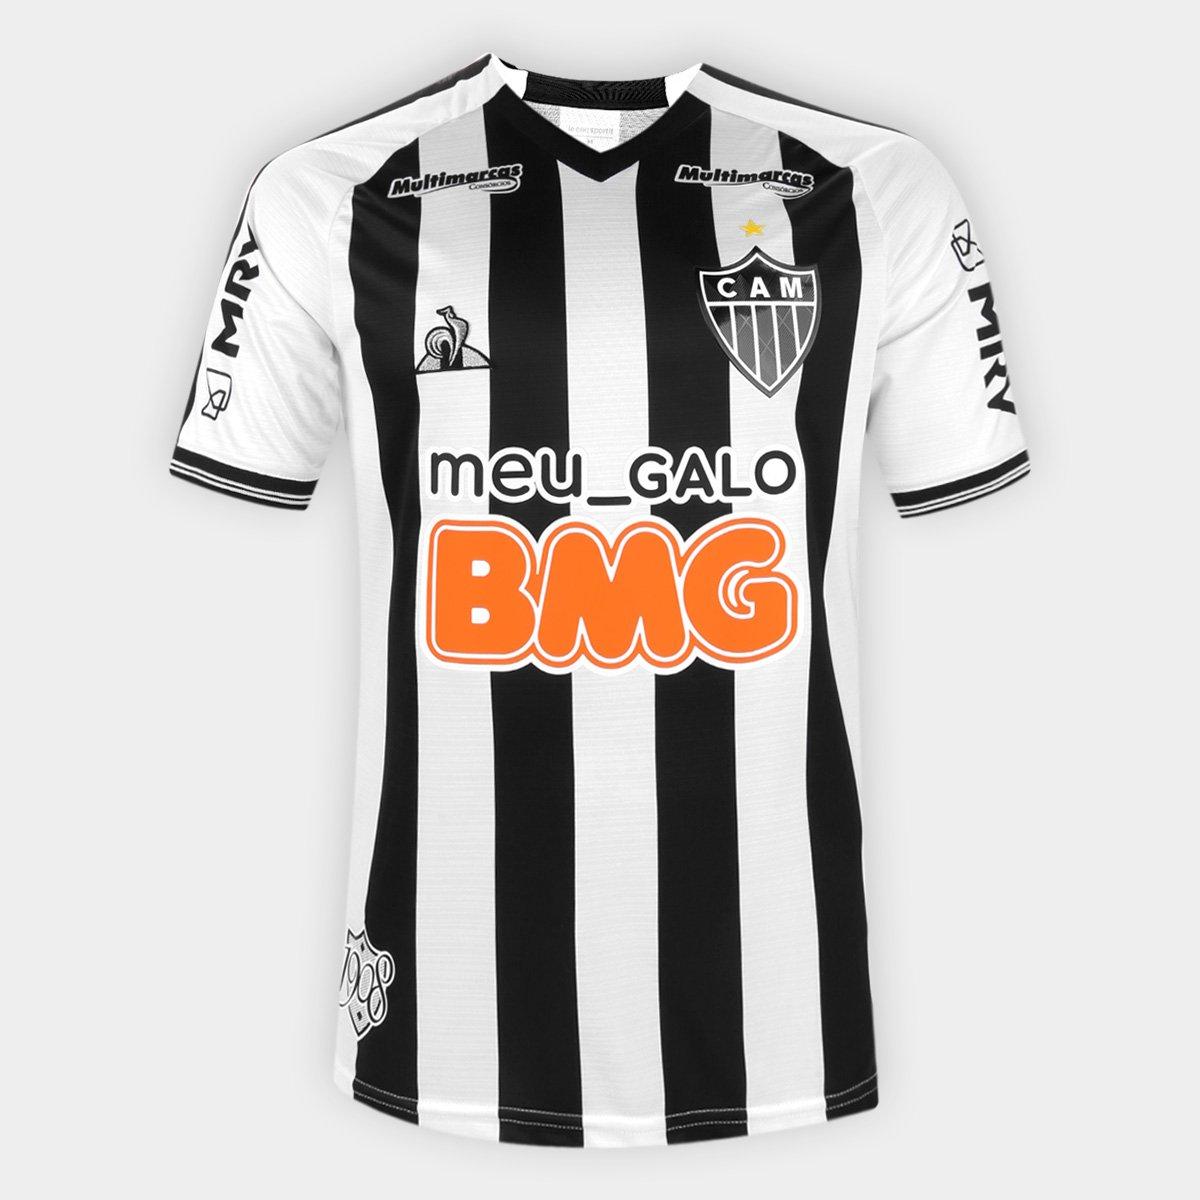 Camisa Atletico Mineiro I 20 21 S N Torcedor Le Coq Masculina Preto E Branco Netshoes